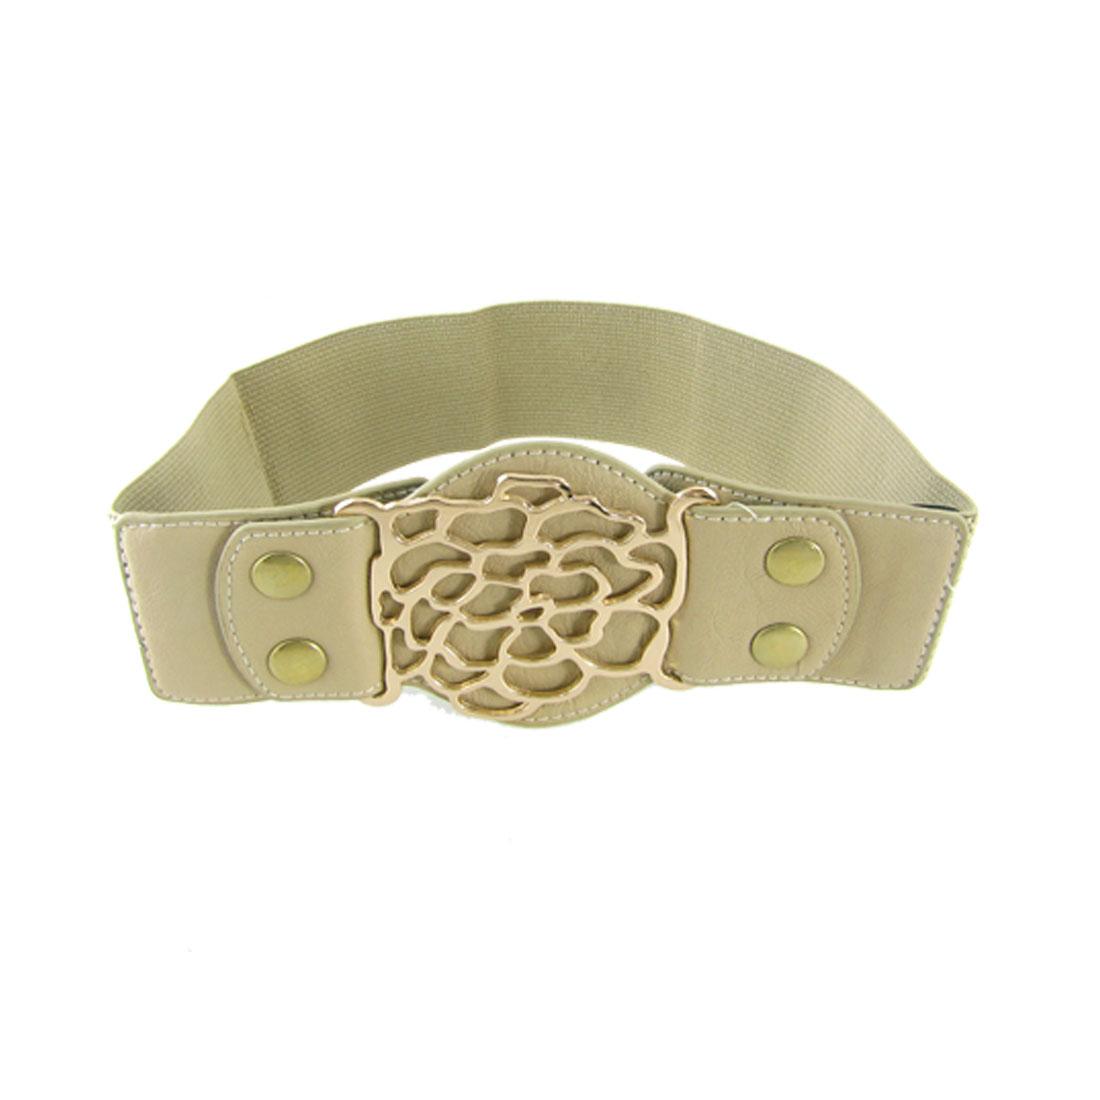 Press Stud Closure Metal Hollowed Buckle Stretchable Khaki Waist Belt for Lady